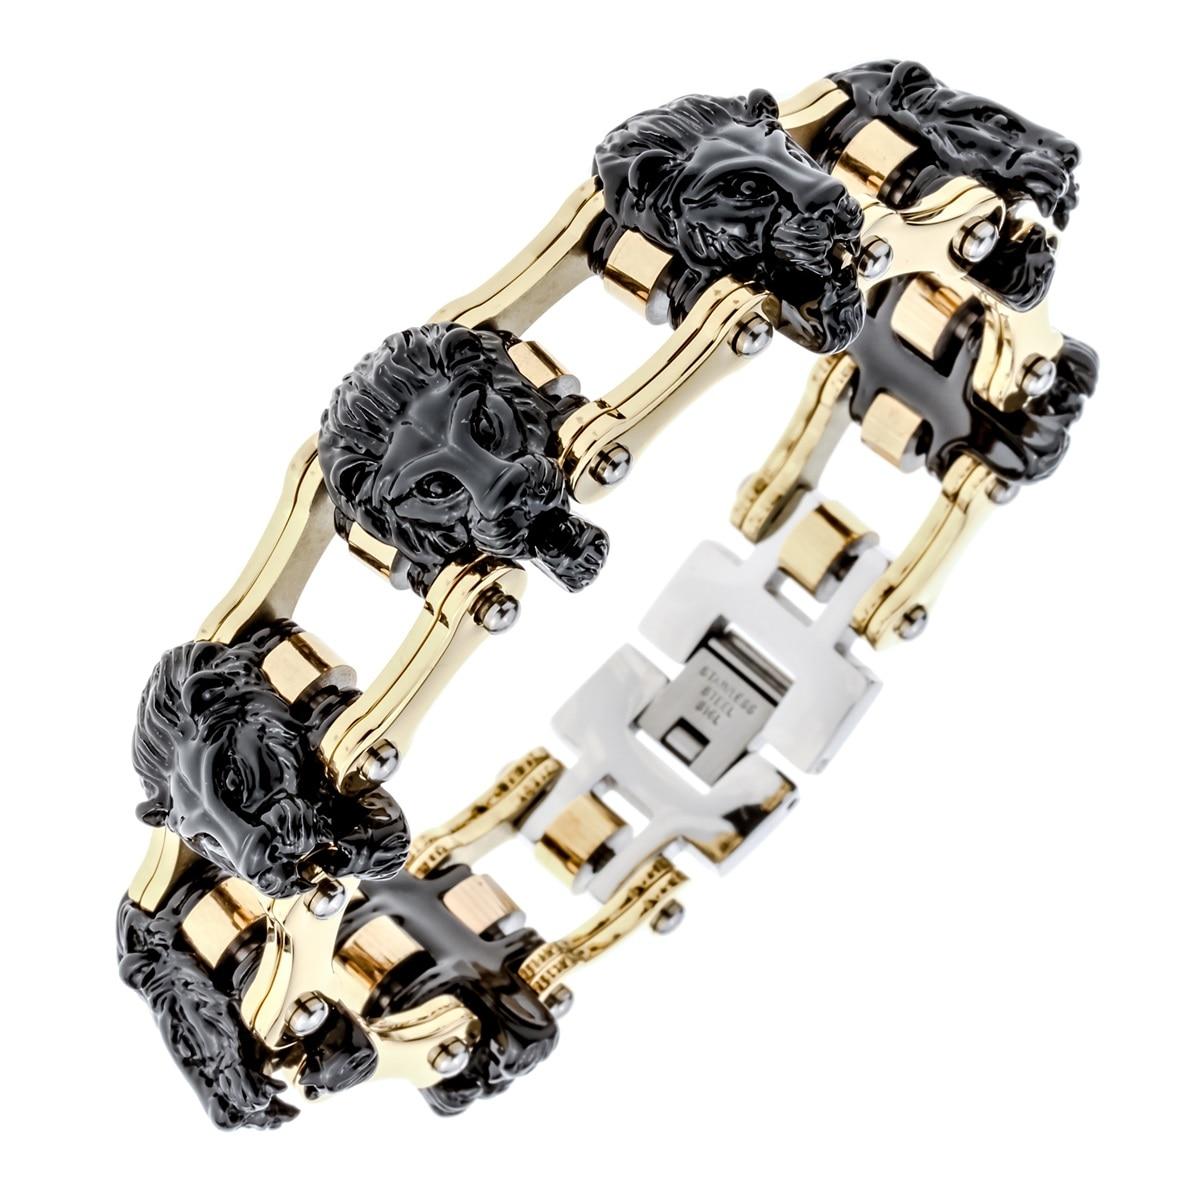 Mens stainless steel lion link chain bracelet biker heavy jewelry birthday gifts for dad him boyfriend D033 dropship 8.5 opk biker stainless steel men bracelet